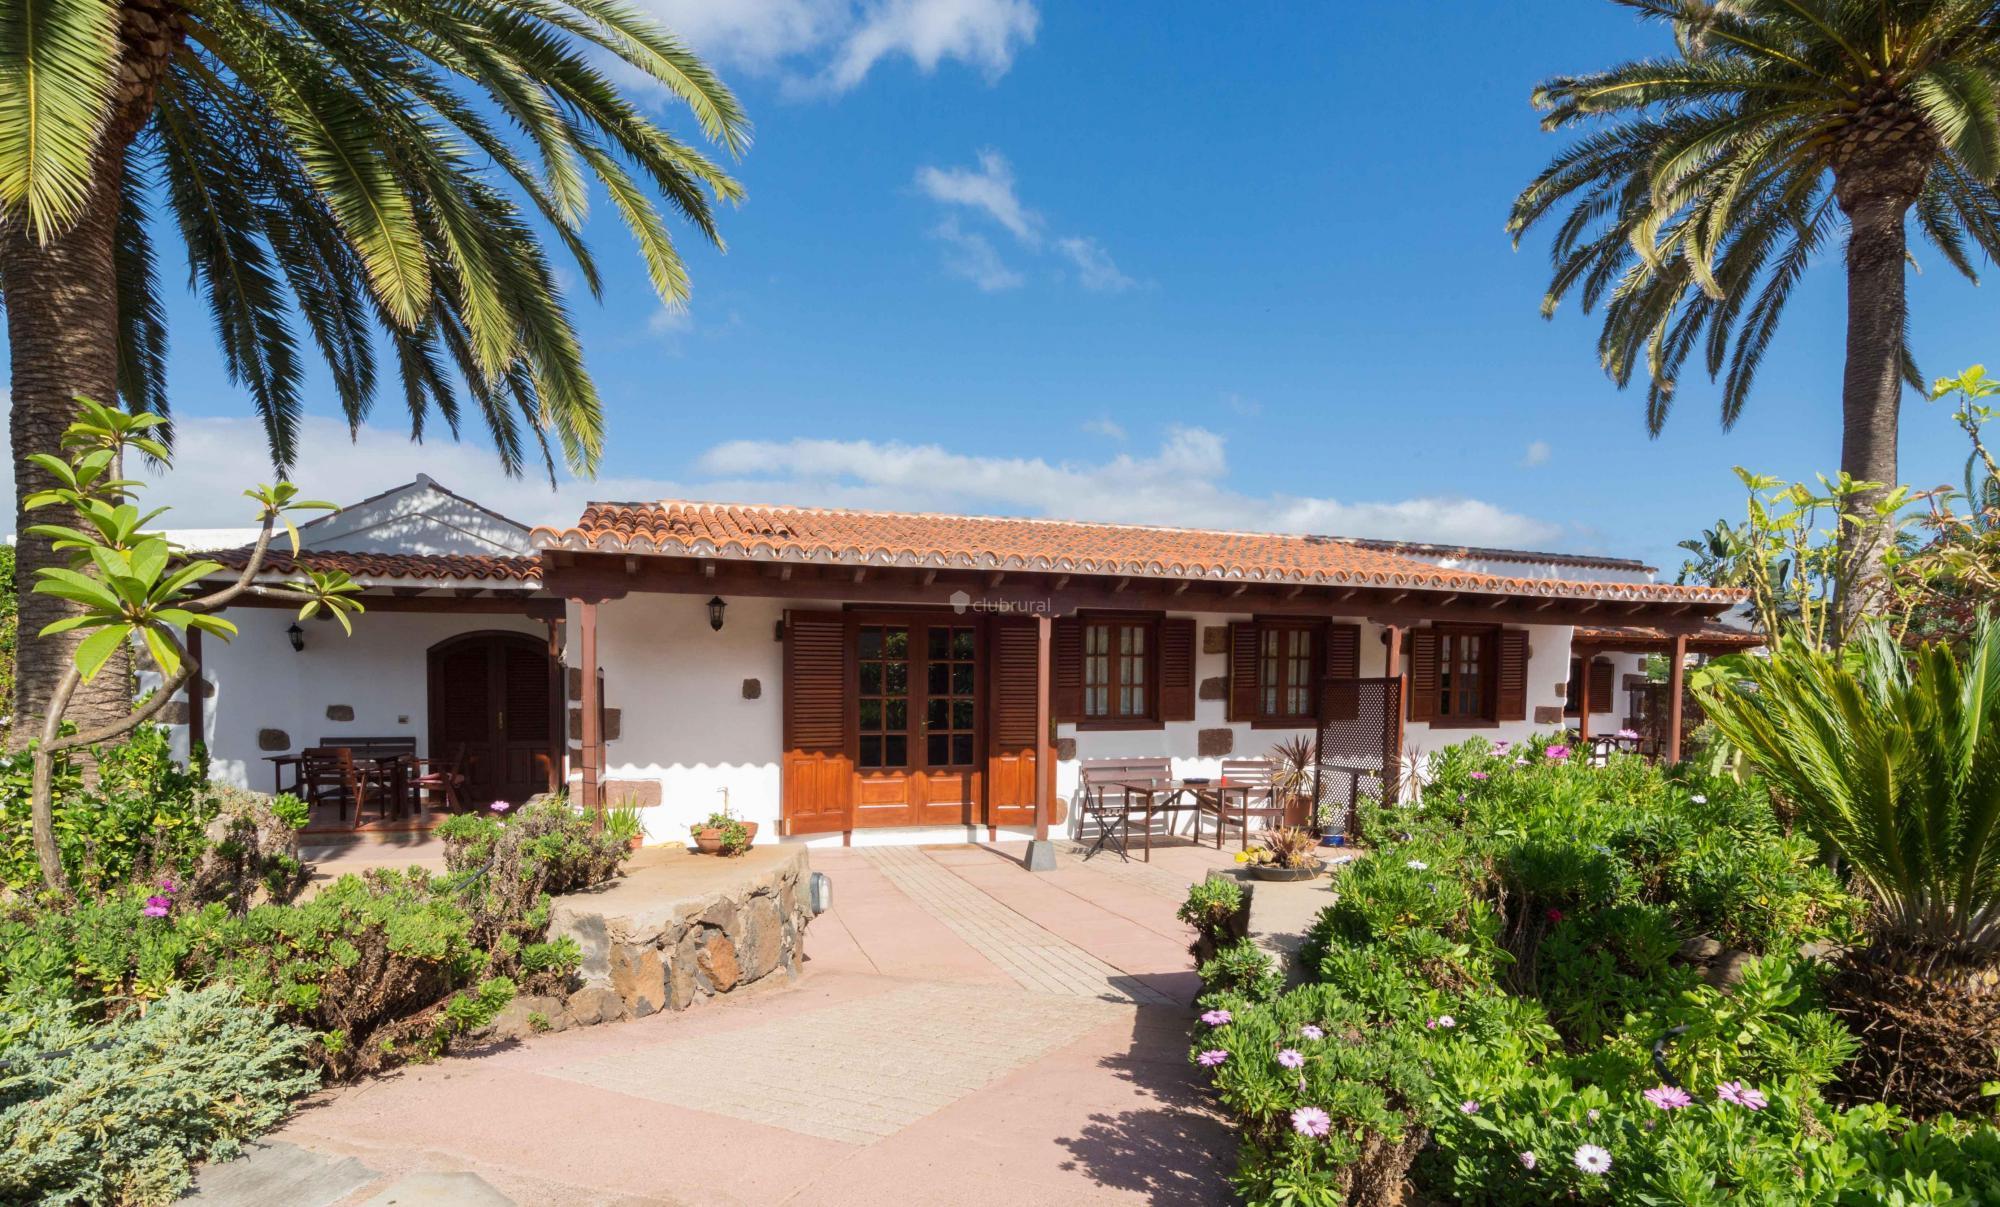 Fotos de Finca el Picacho  Tenerife  La Laguna  Clubrural